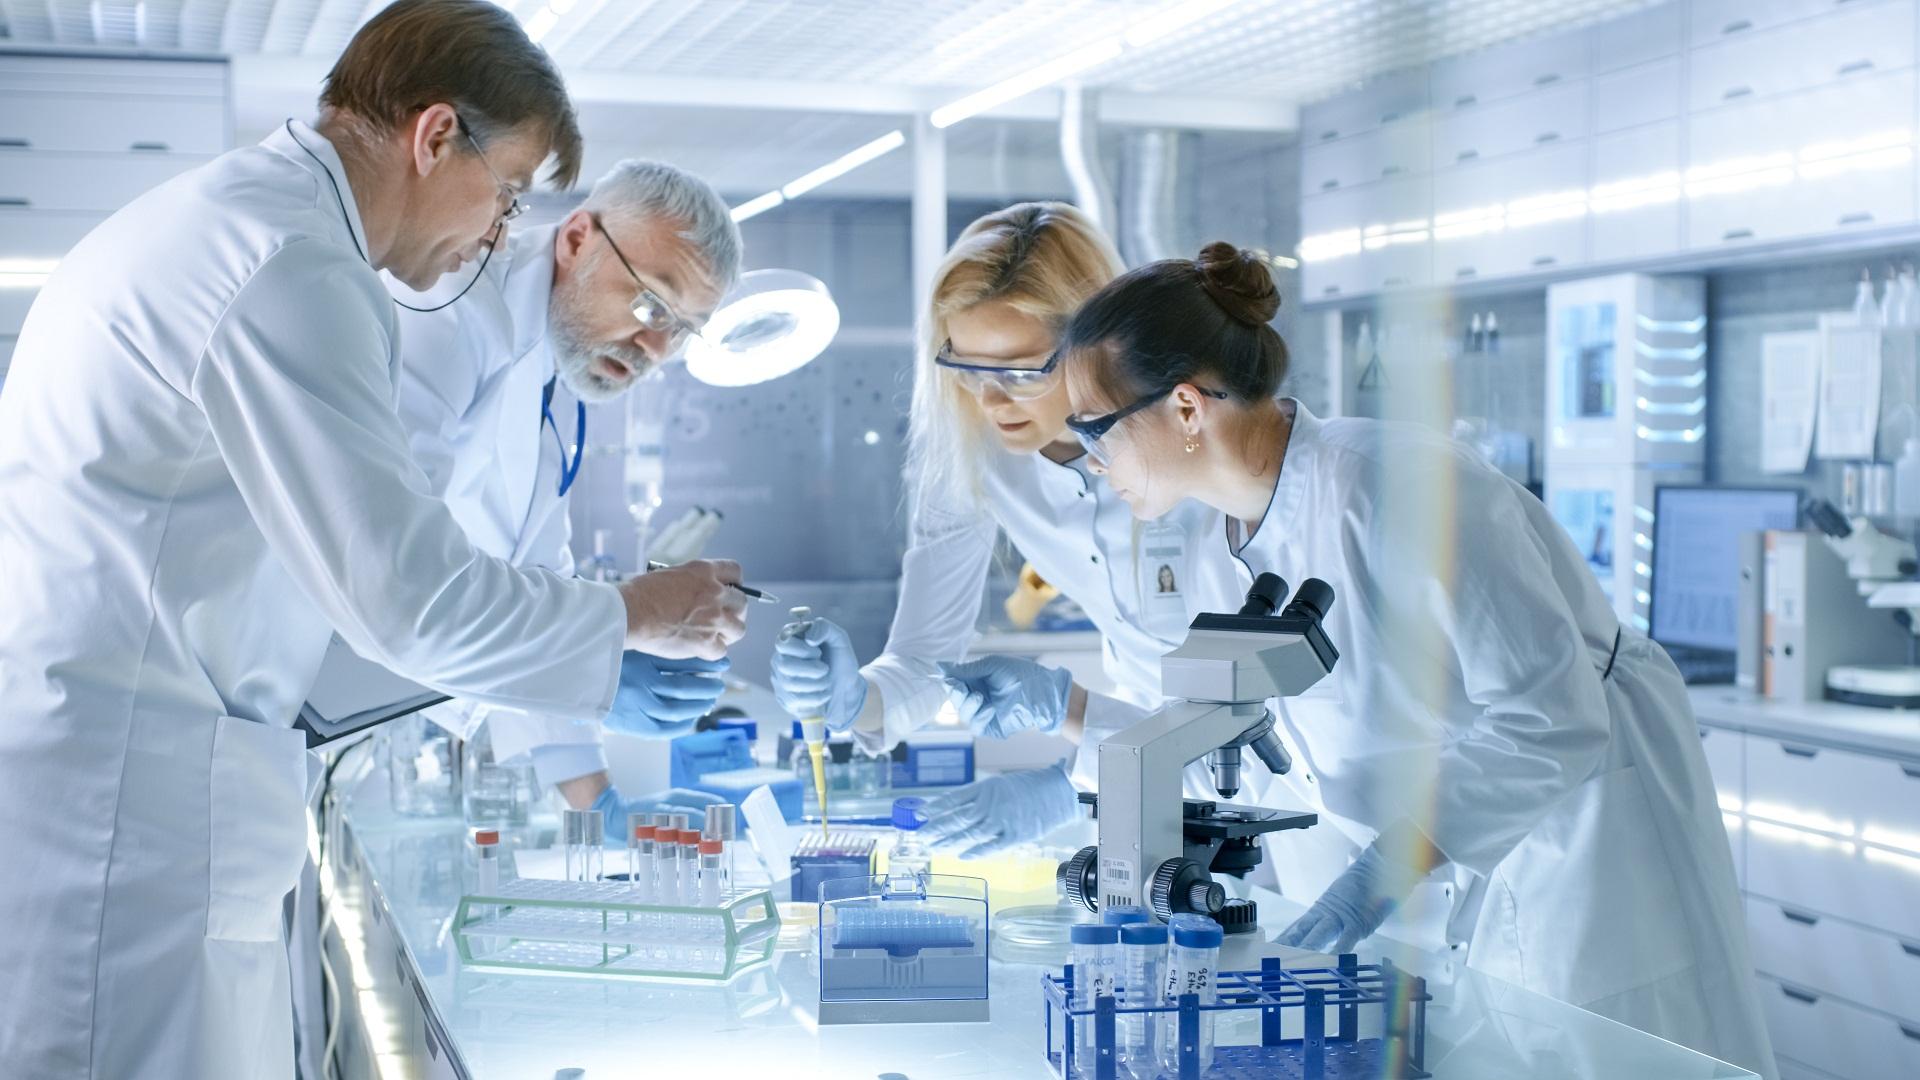 Teste genético; testes genéticos; triagem neonatal; teste genético para portadores; teste pré-natal; teste genético pré-implantacional; teste forense